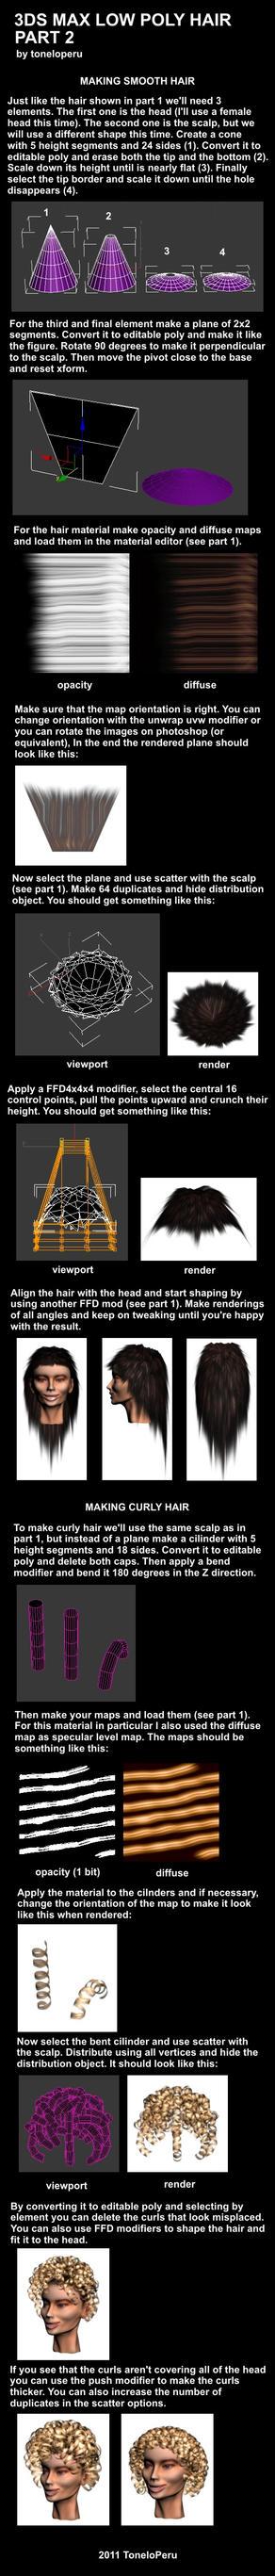 Low poly hair tutorial pt 2 by toneloperu